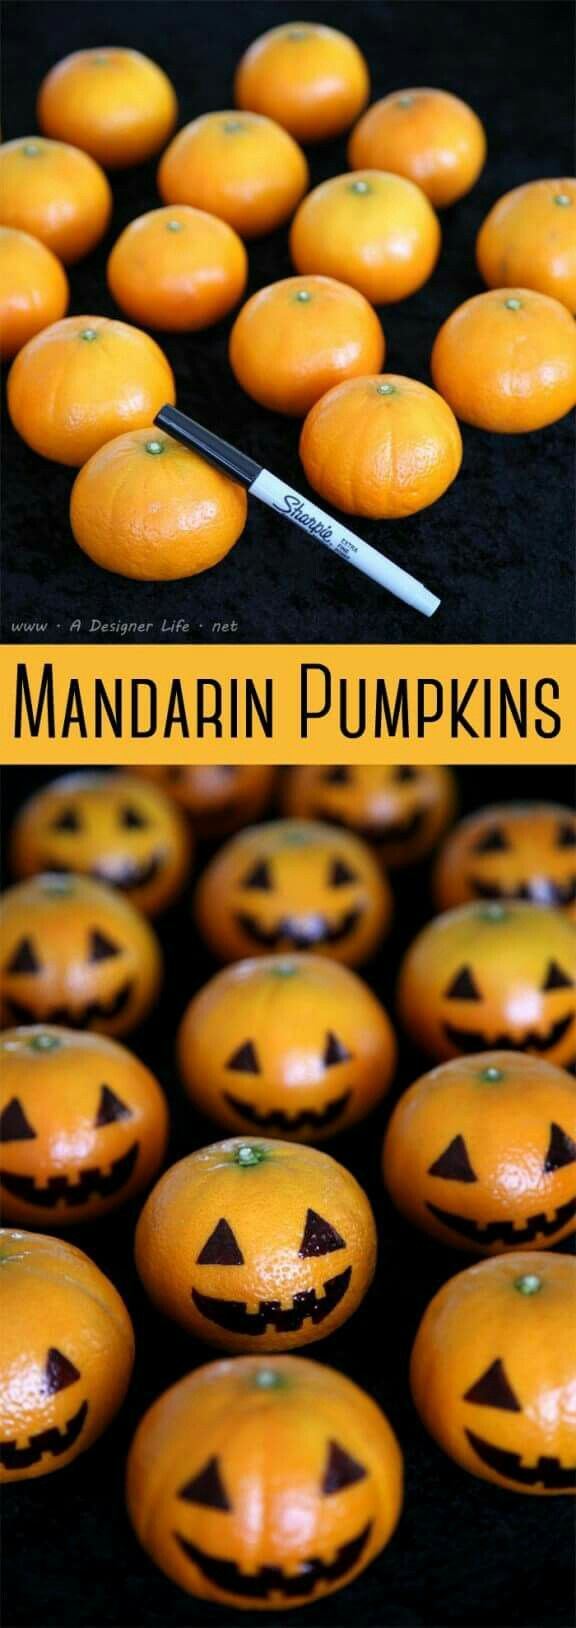 Halloween party ideas for kids... little citrus pumpkins =)